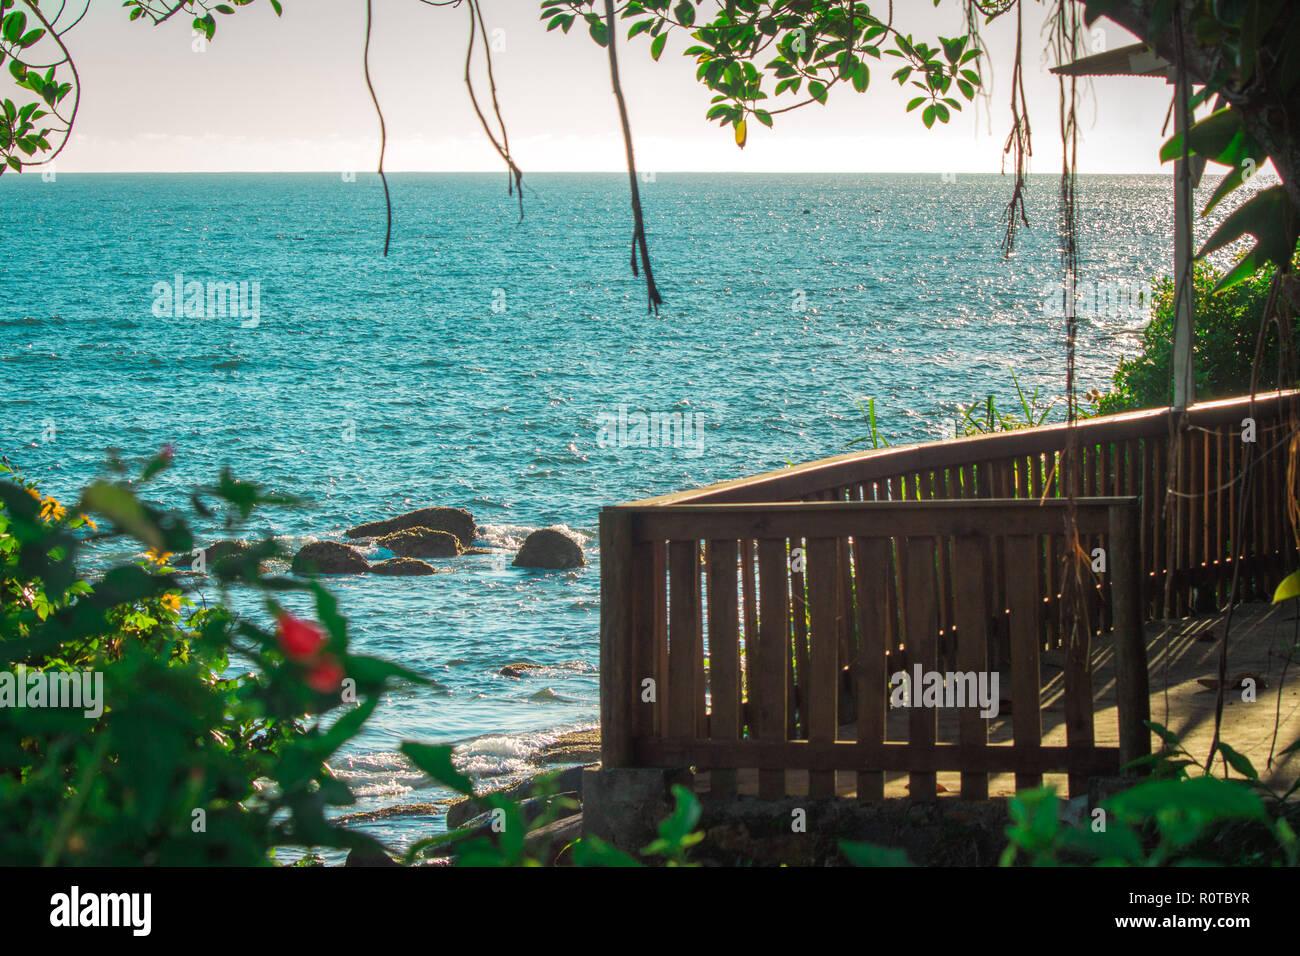 balcony over the beach and blue ocean at Florianopolis, Santa Catarina, Brazil - Stock Image